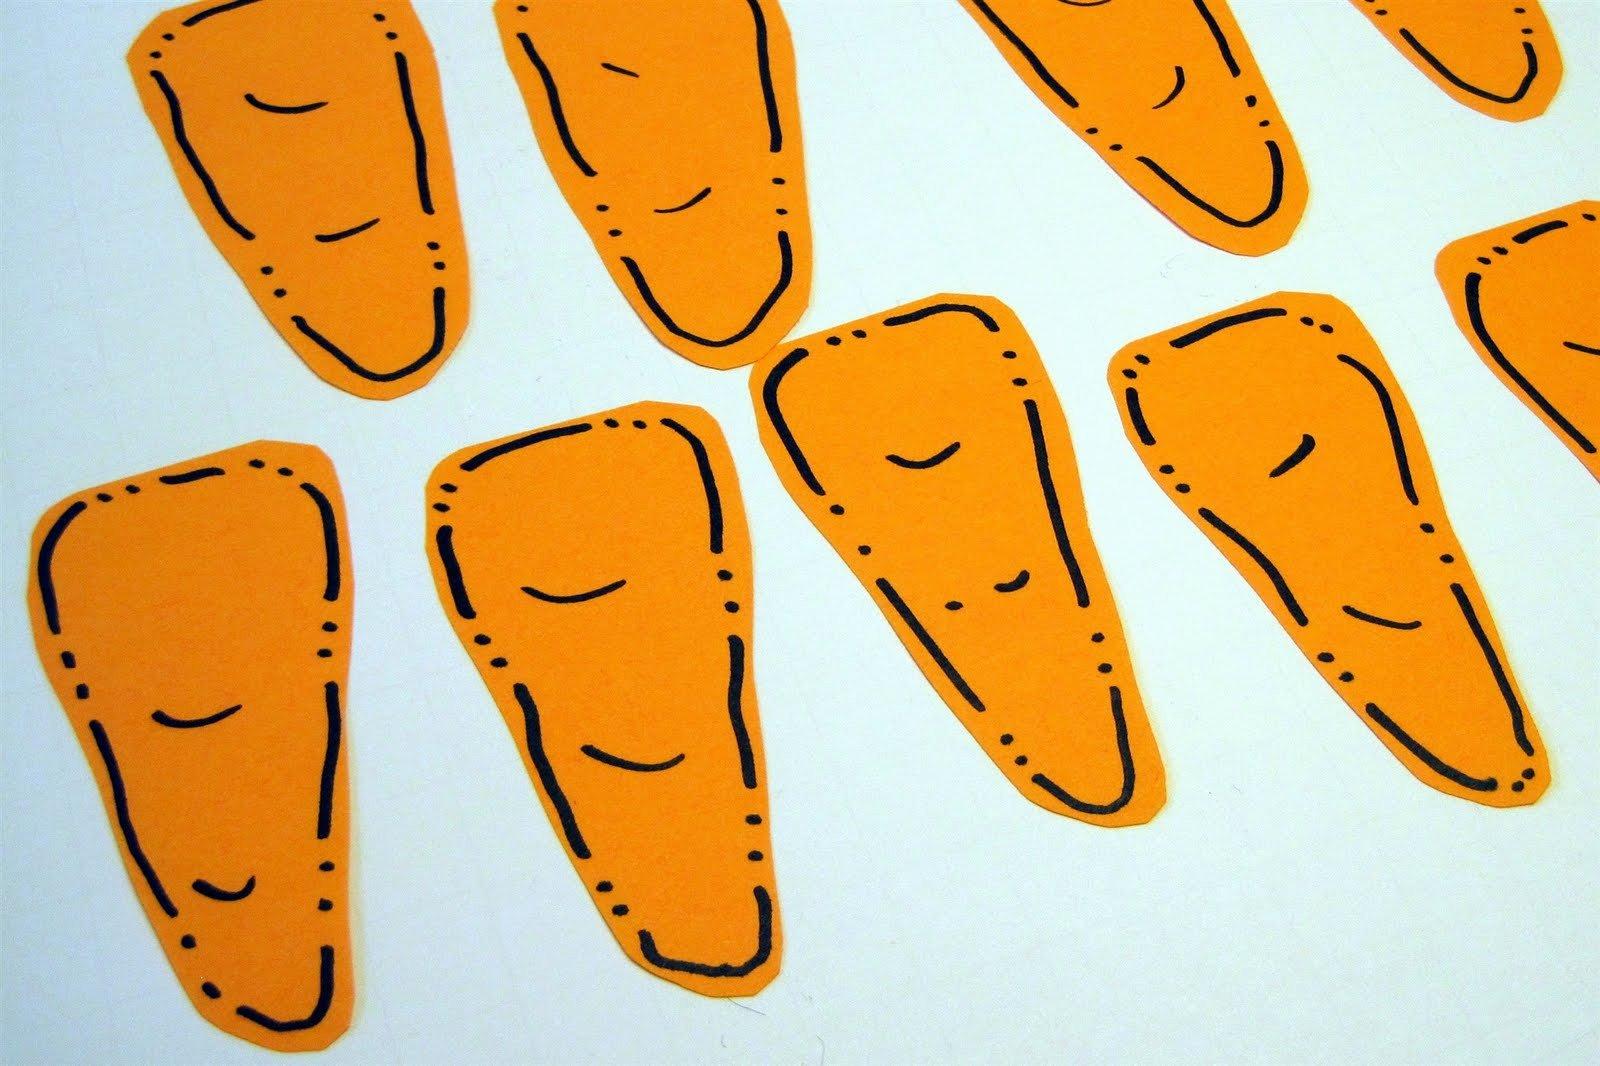 Carrot Nose Printable Artfully Arranged Disarray Cute Snowman Game